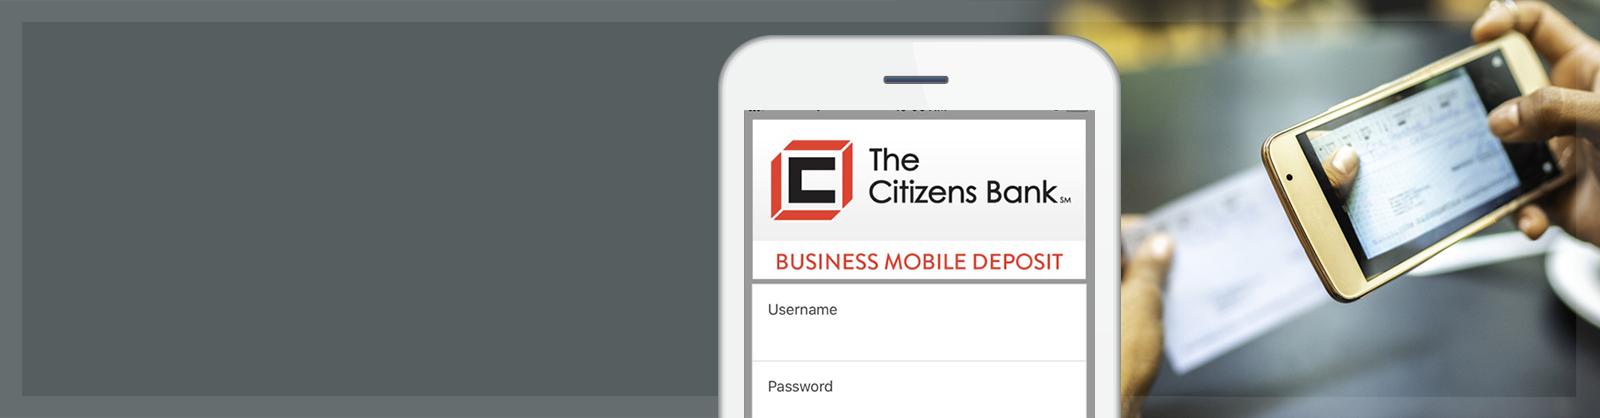 Citizens Bank Mobile Deposit App